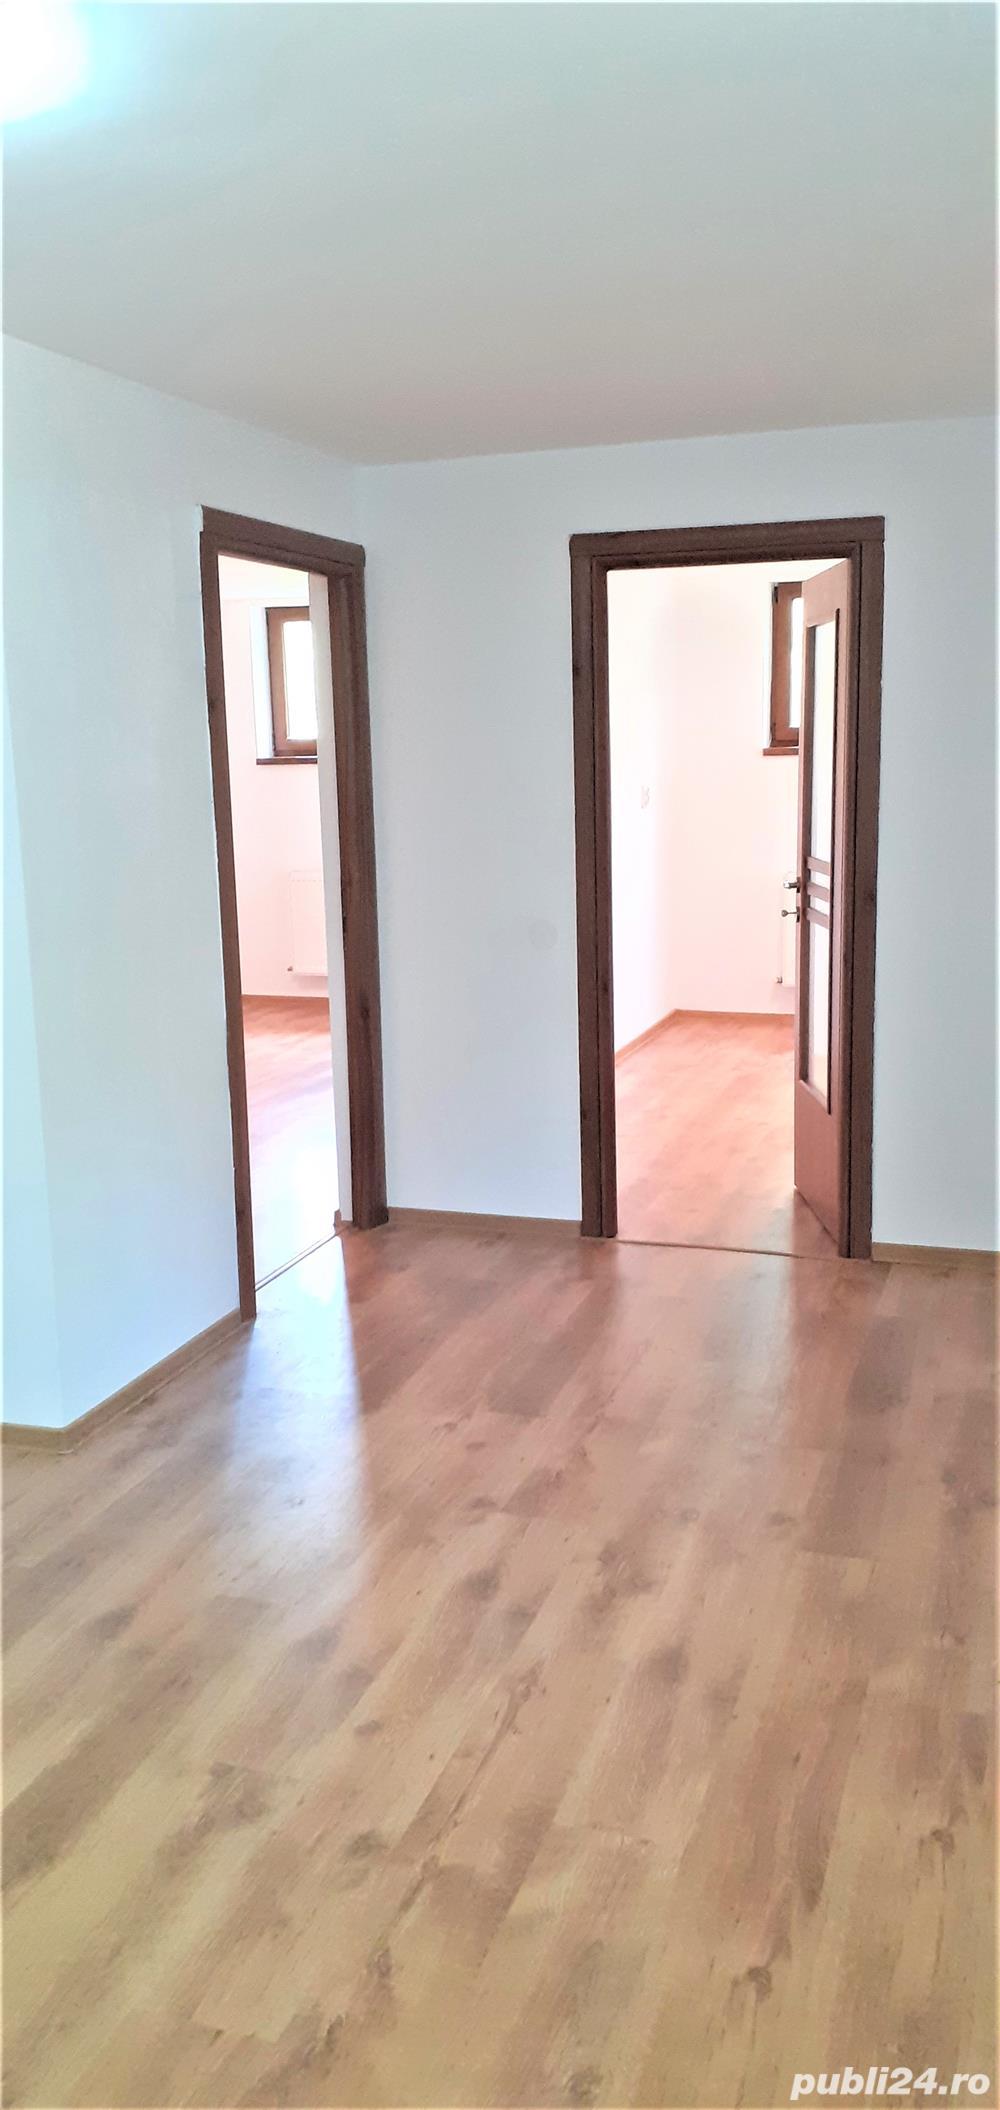 Apartament 2 camere, 55 mp imobil nou ideal invetitie